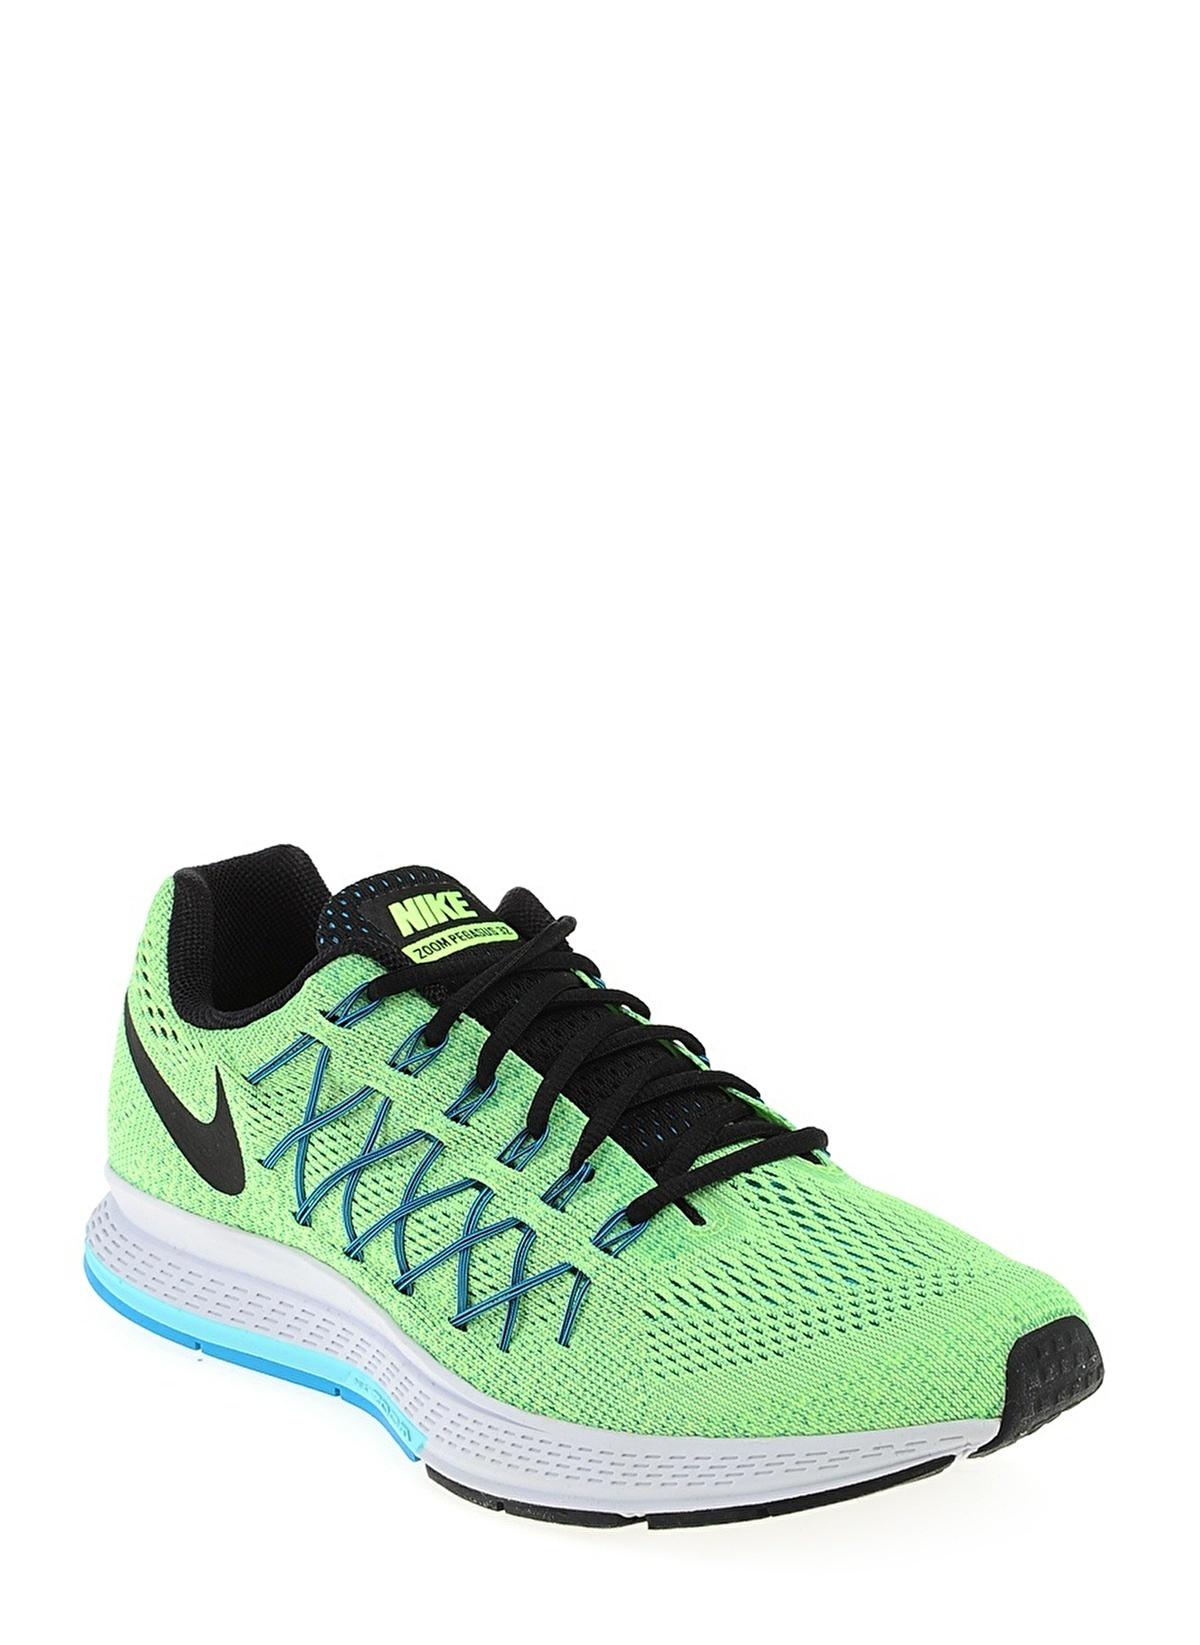 super cute big discount uk cheap sale 749340-300-Nike-Air-Zoom-Pegasus-32